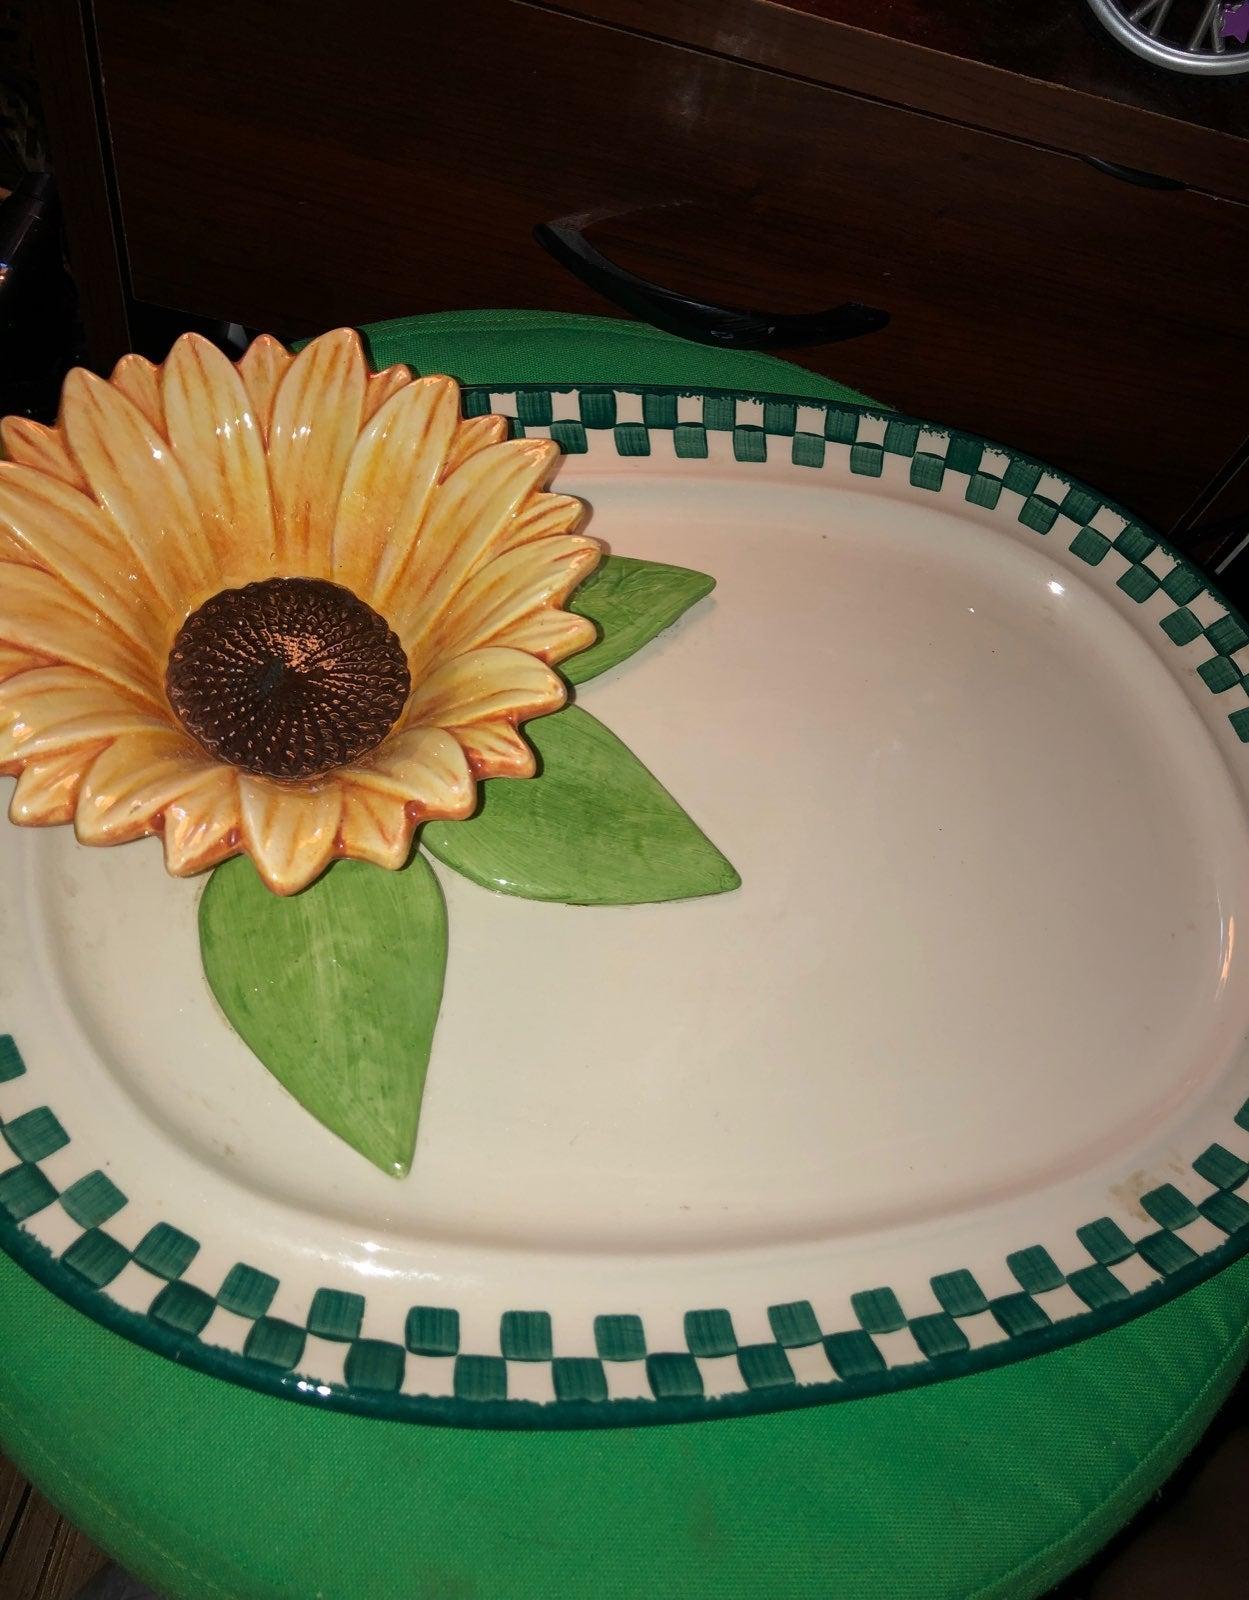 Handmade Sunflower Plate